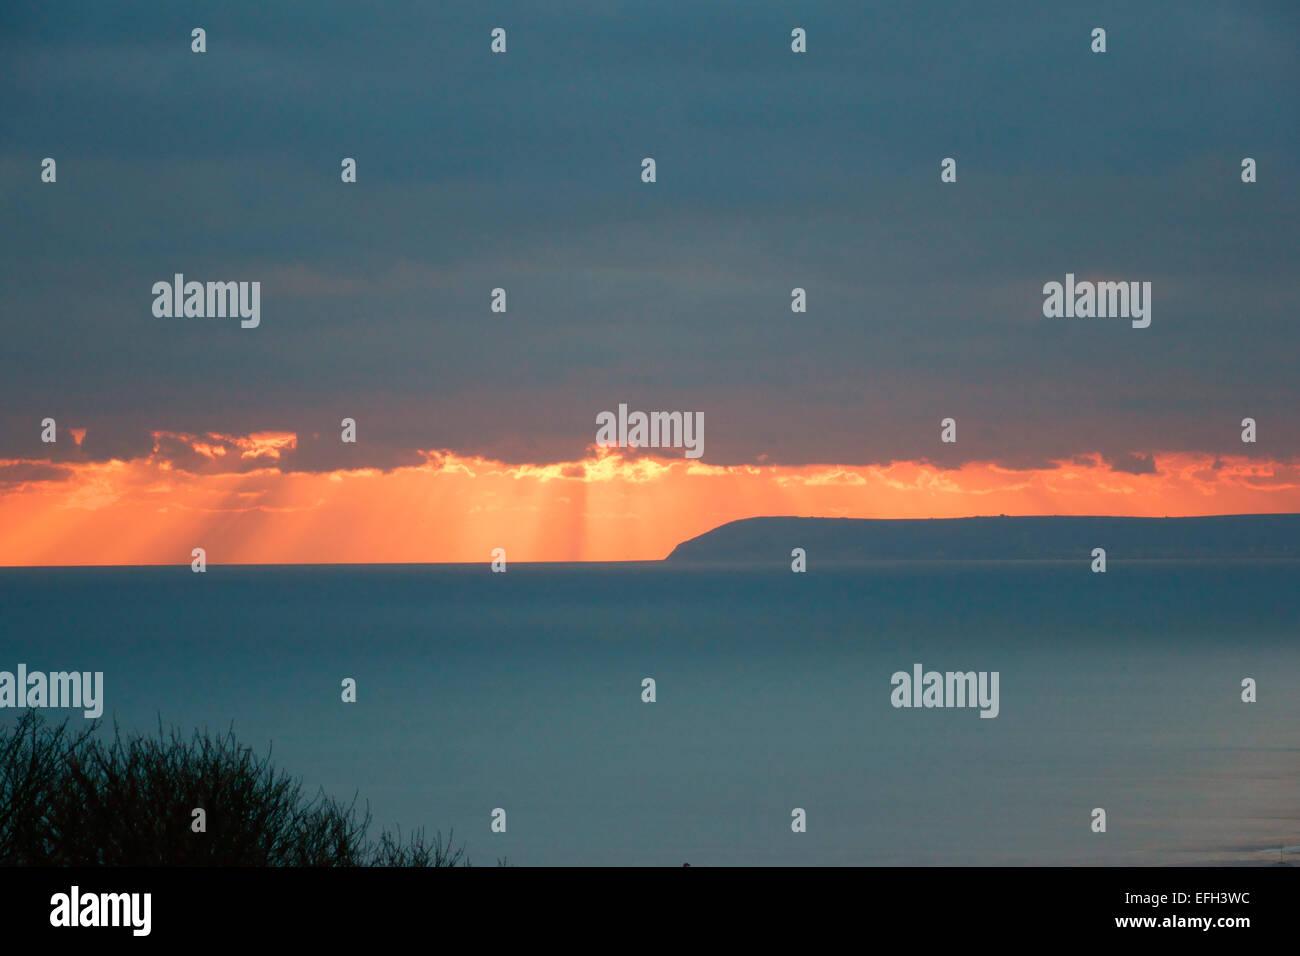 Hastings, East Sussex, England, UK. Die dramatische winter Sonnenuntergang Blick von Hastings wie die Sonne über Stockbild